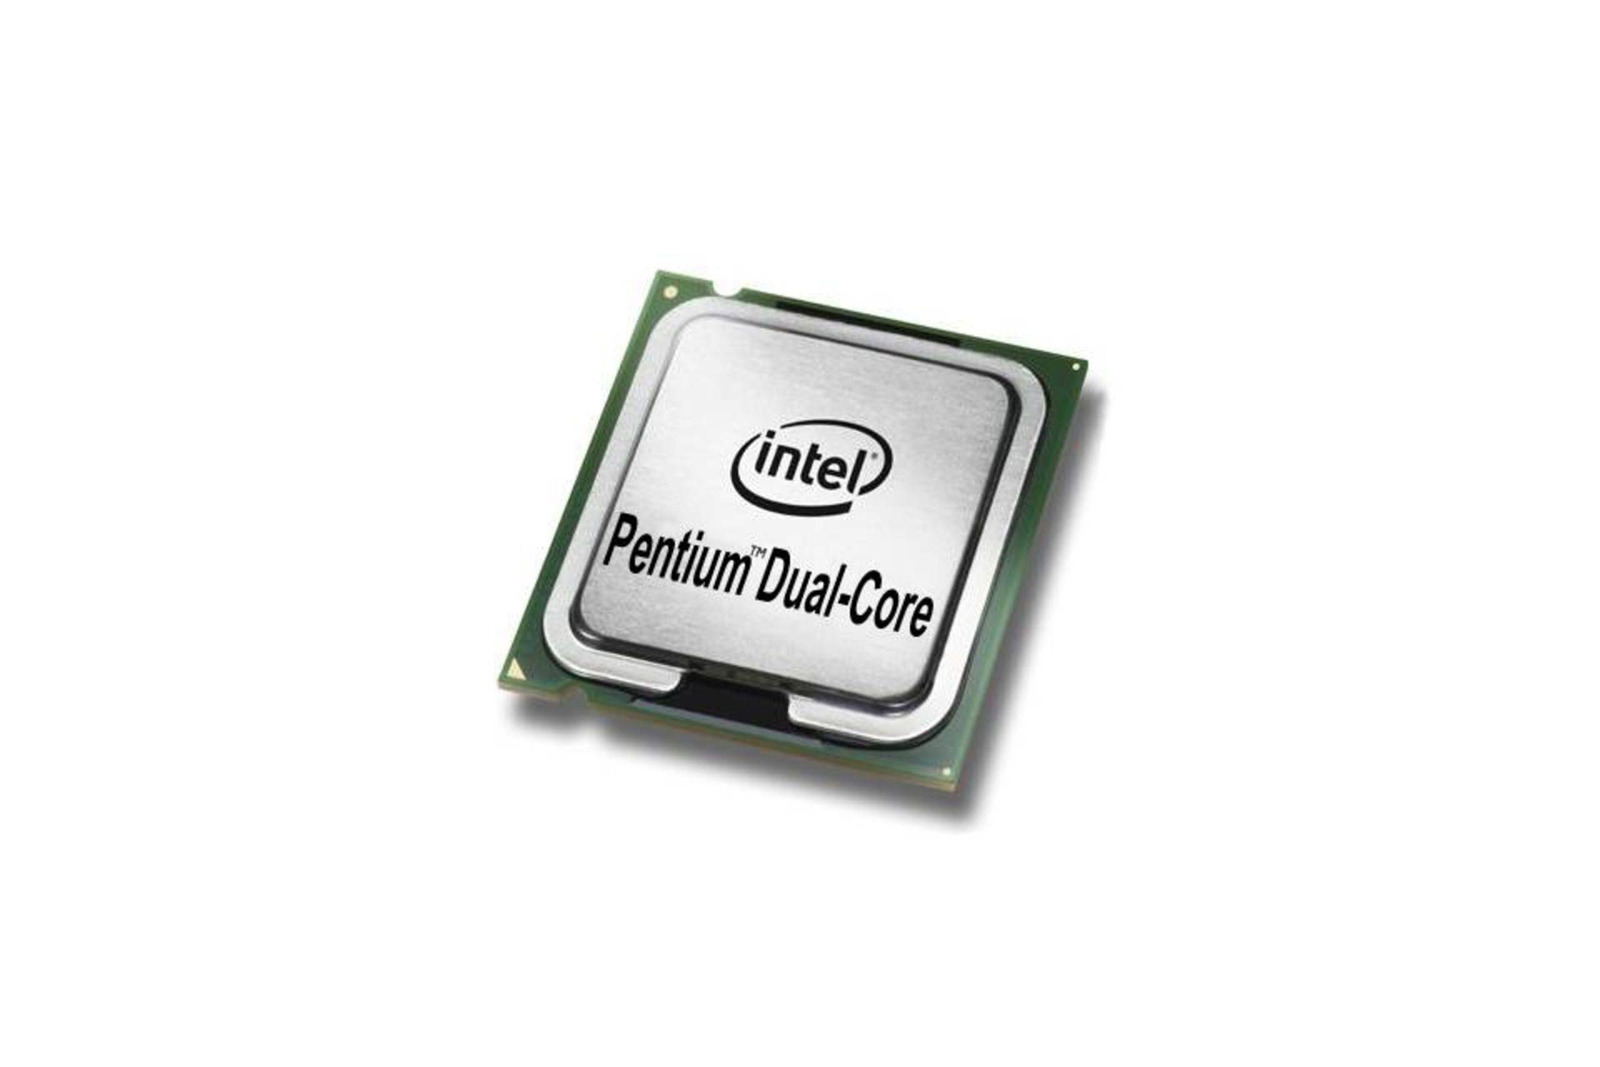 Prozessor Intel Pentium Dual-Core E5200 2.5GHz 2MB LGA775